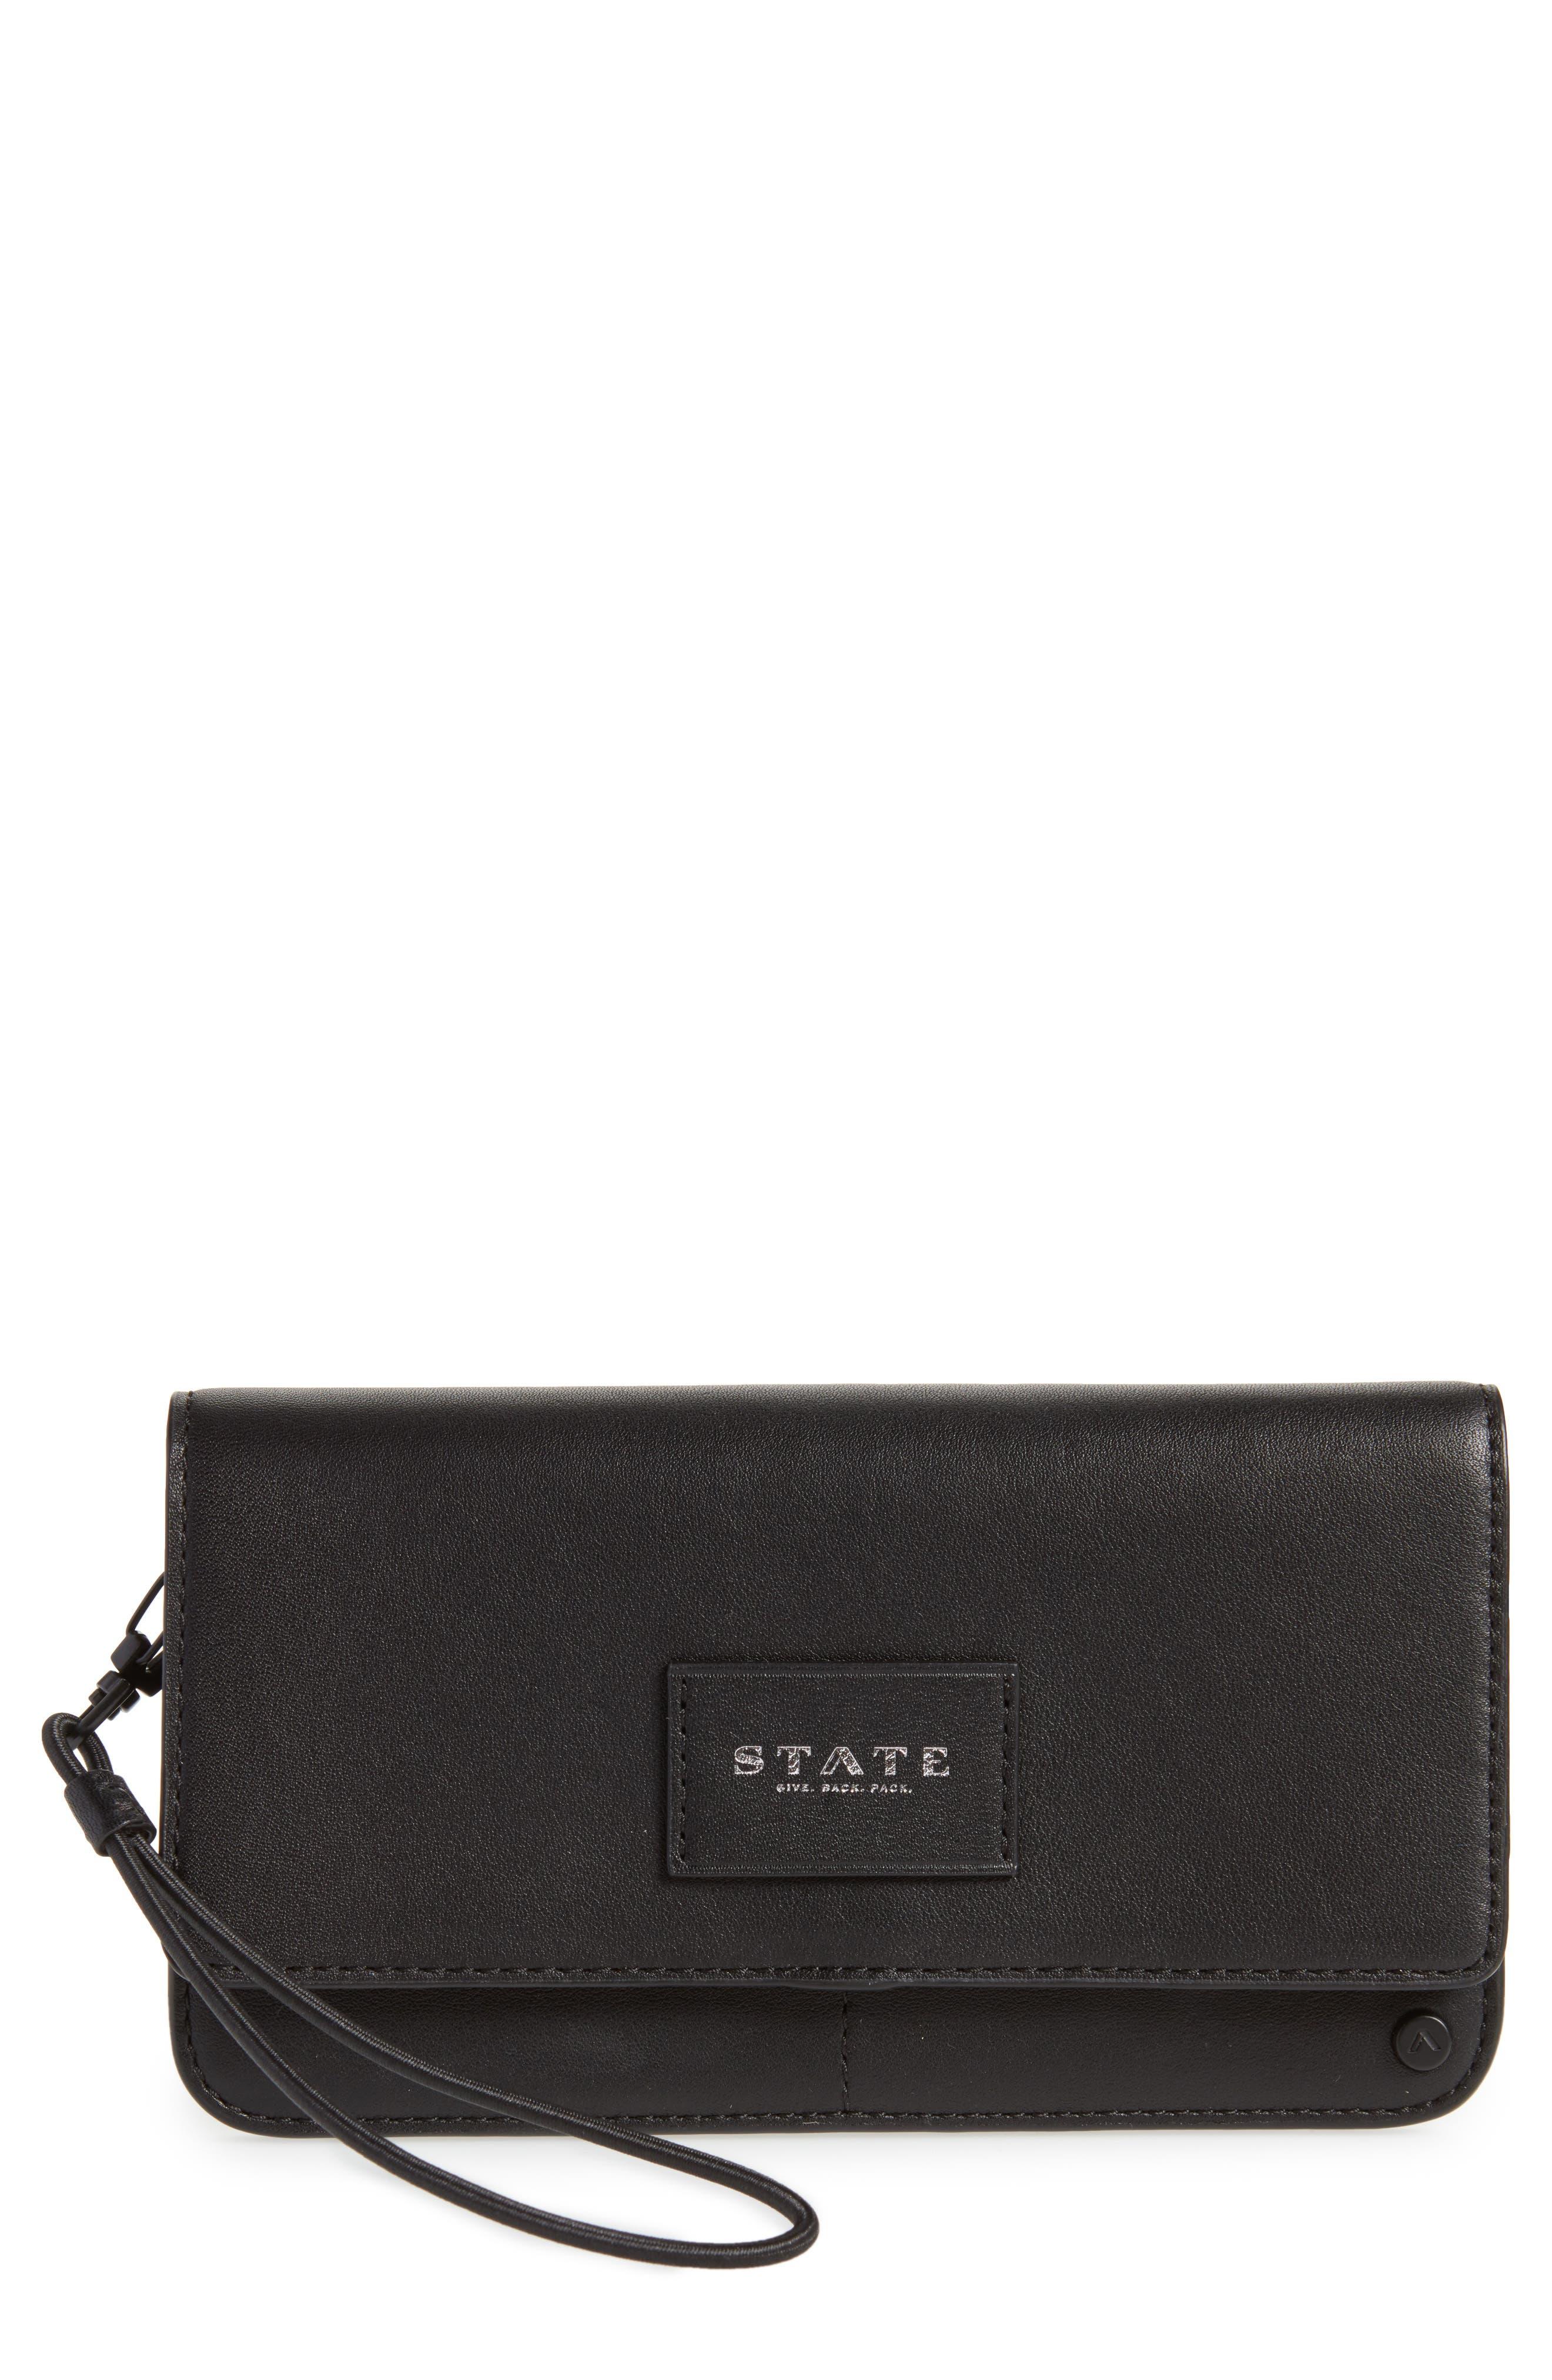 Alternate Image 1 Selected - STATE Bags Parkville Bristol Leather Wristlet